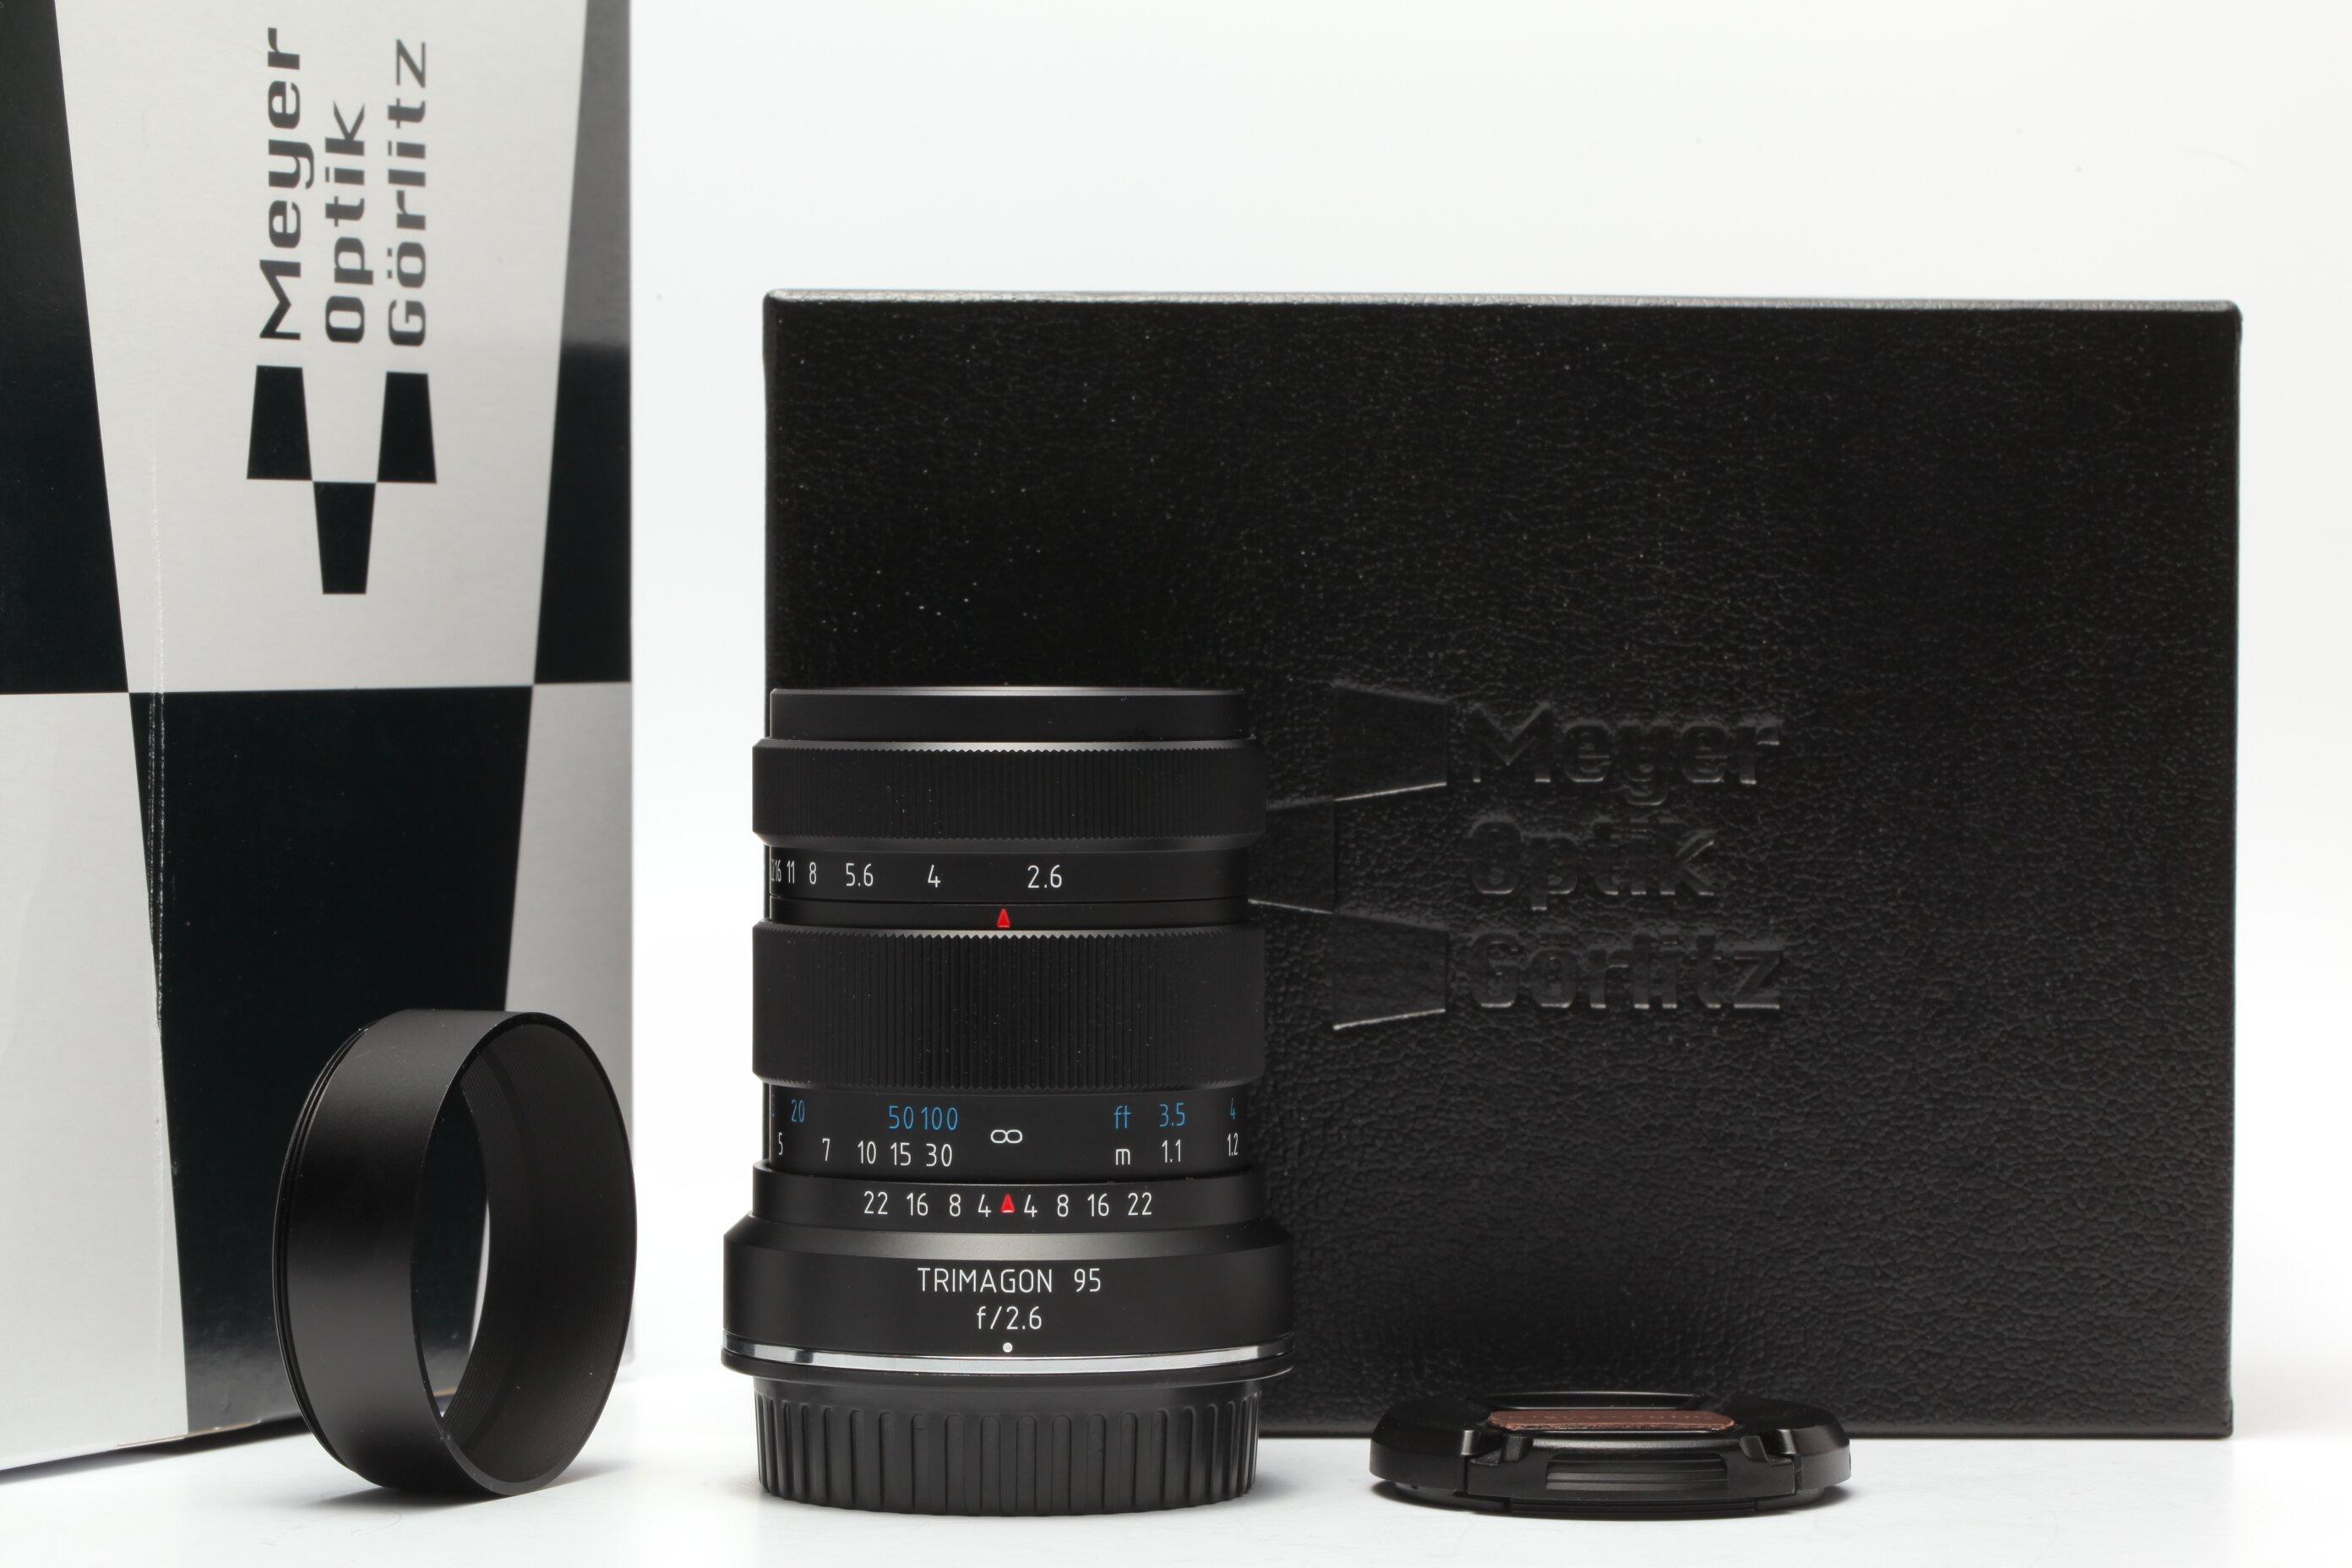 Meyer Optik Görlitz Trimagon 95mm 1:2,6 für Canon EF